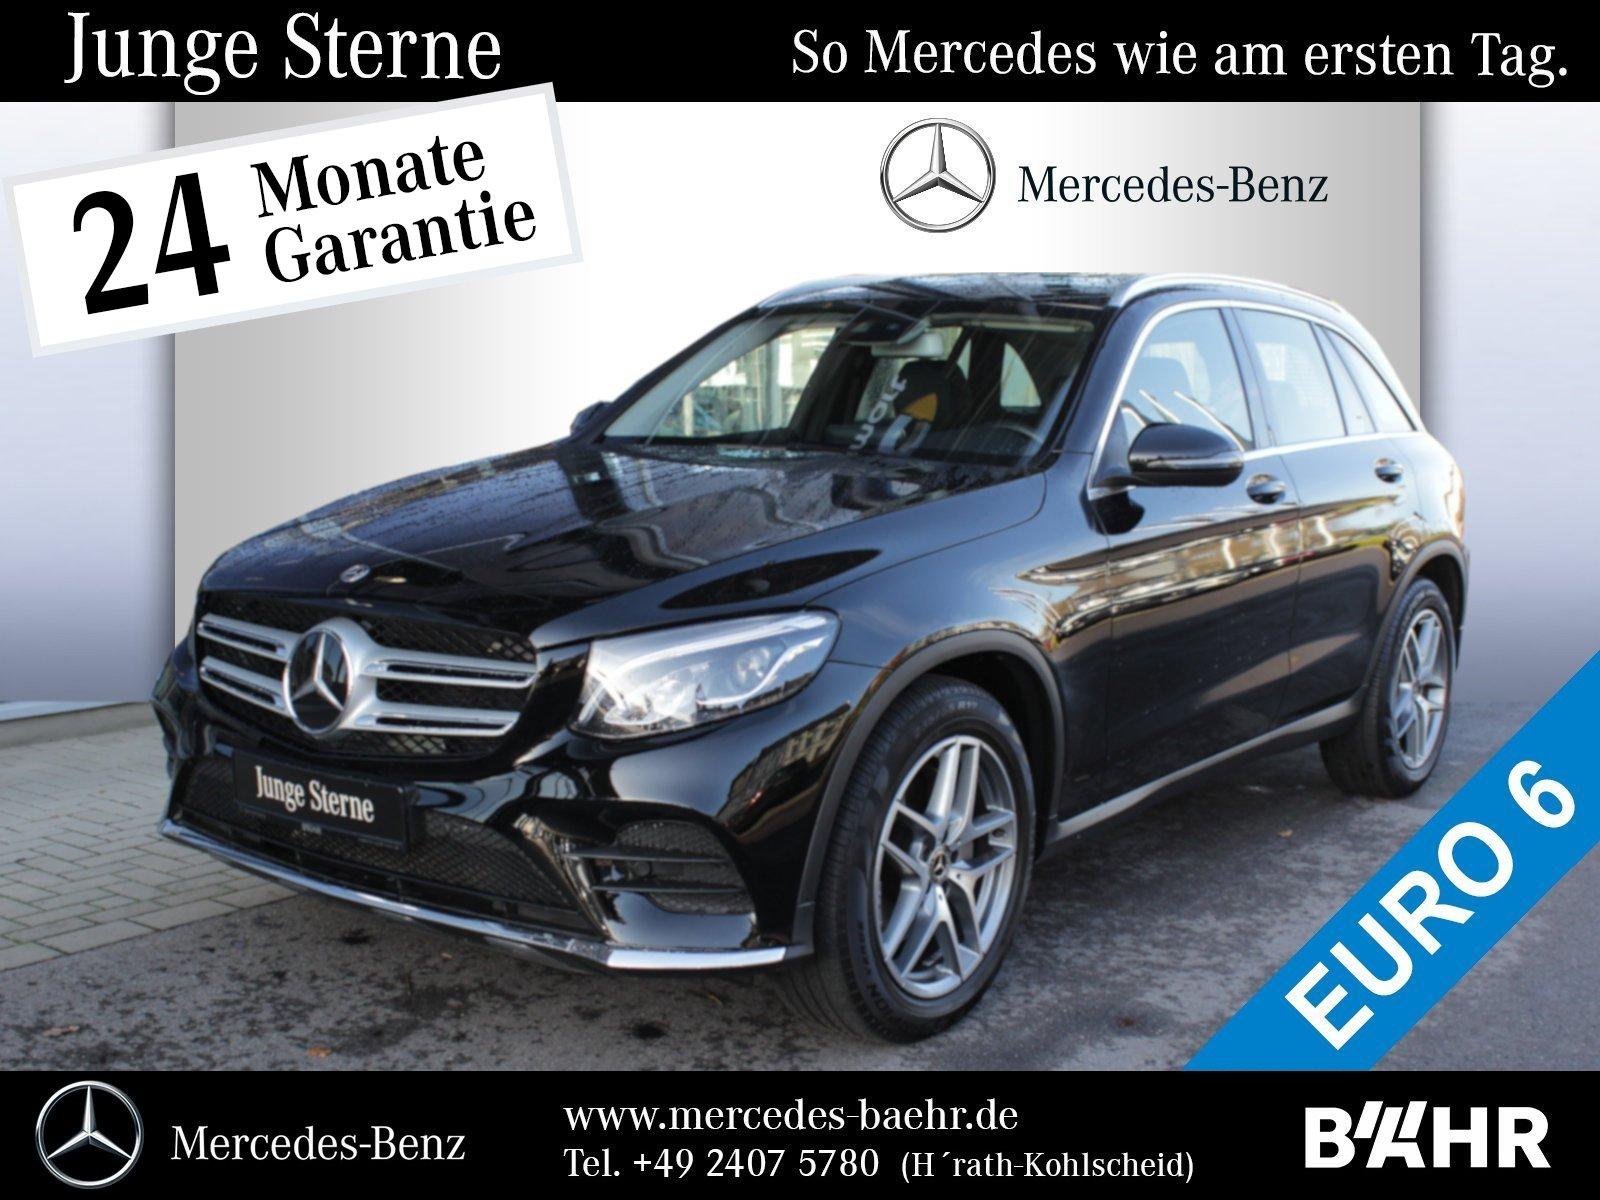 Mercedes-Benz GLC 300 4M AMG/Comand/LED/Distronic/Standheizung, Jahr 2017, petrol